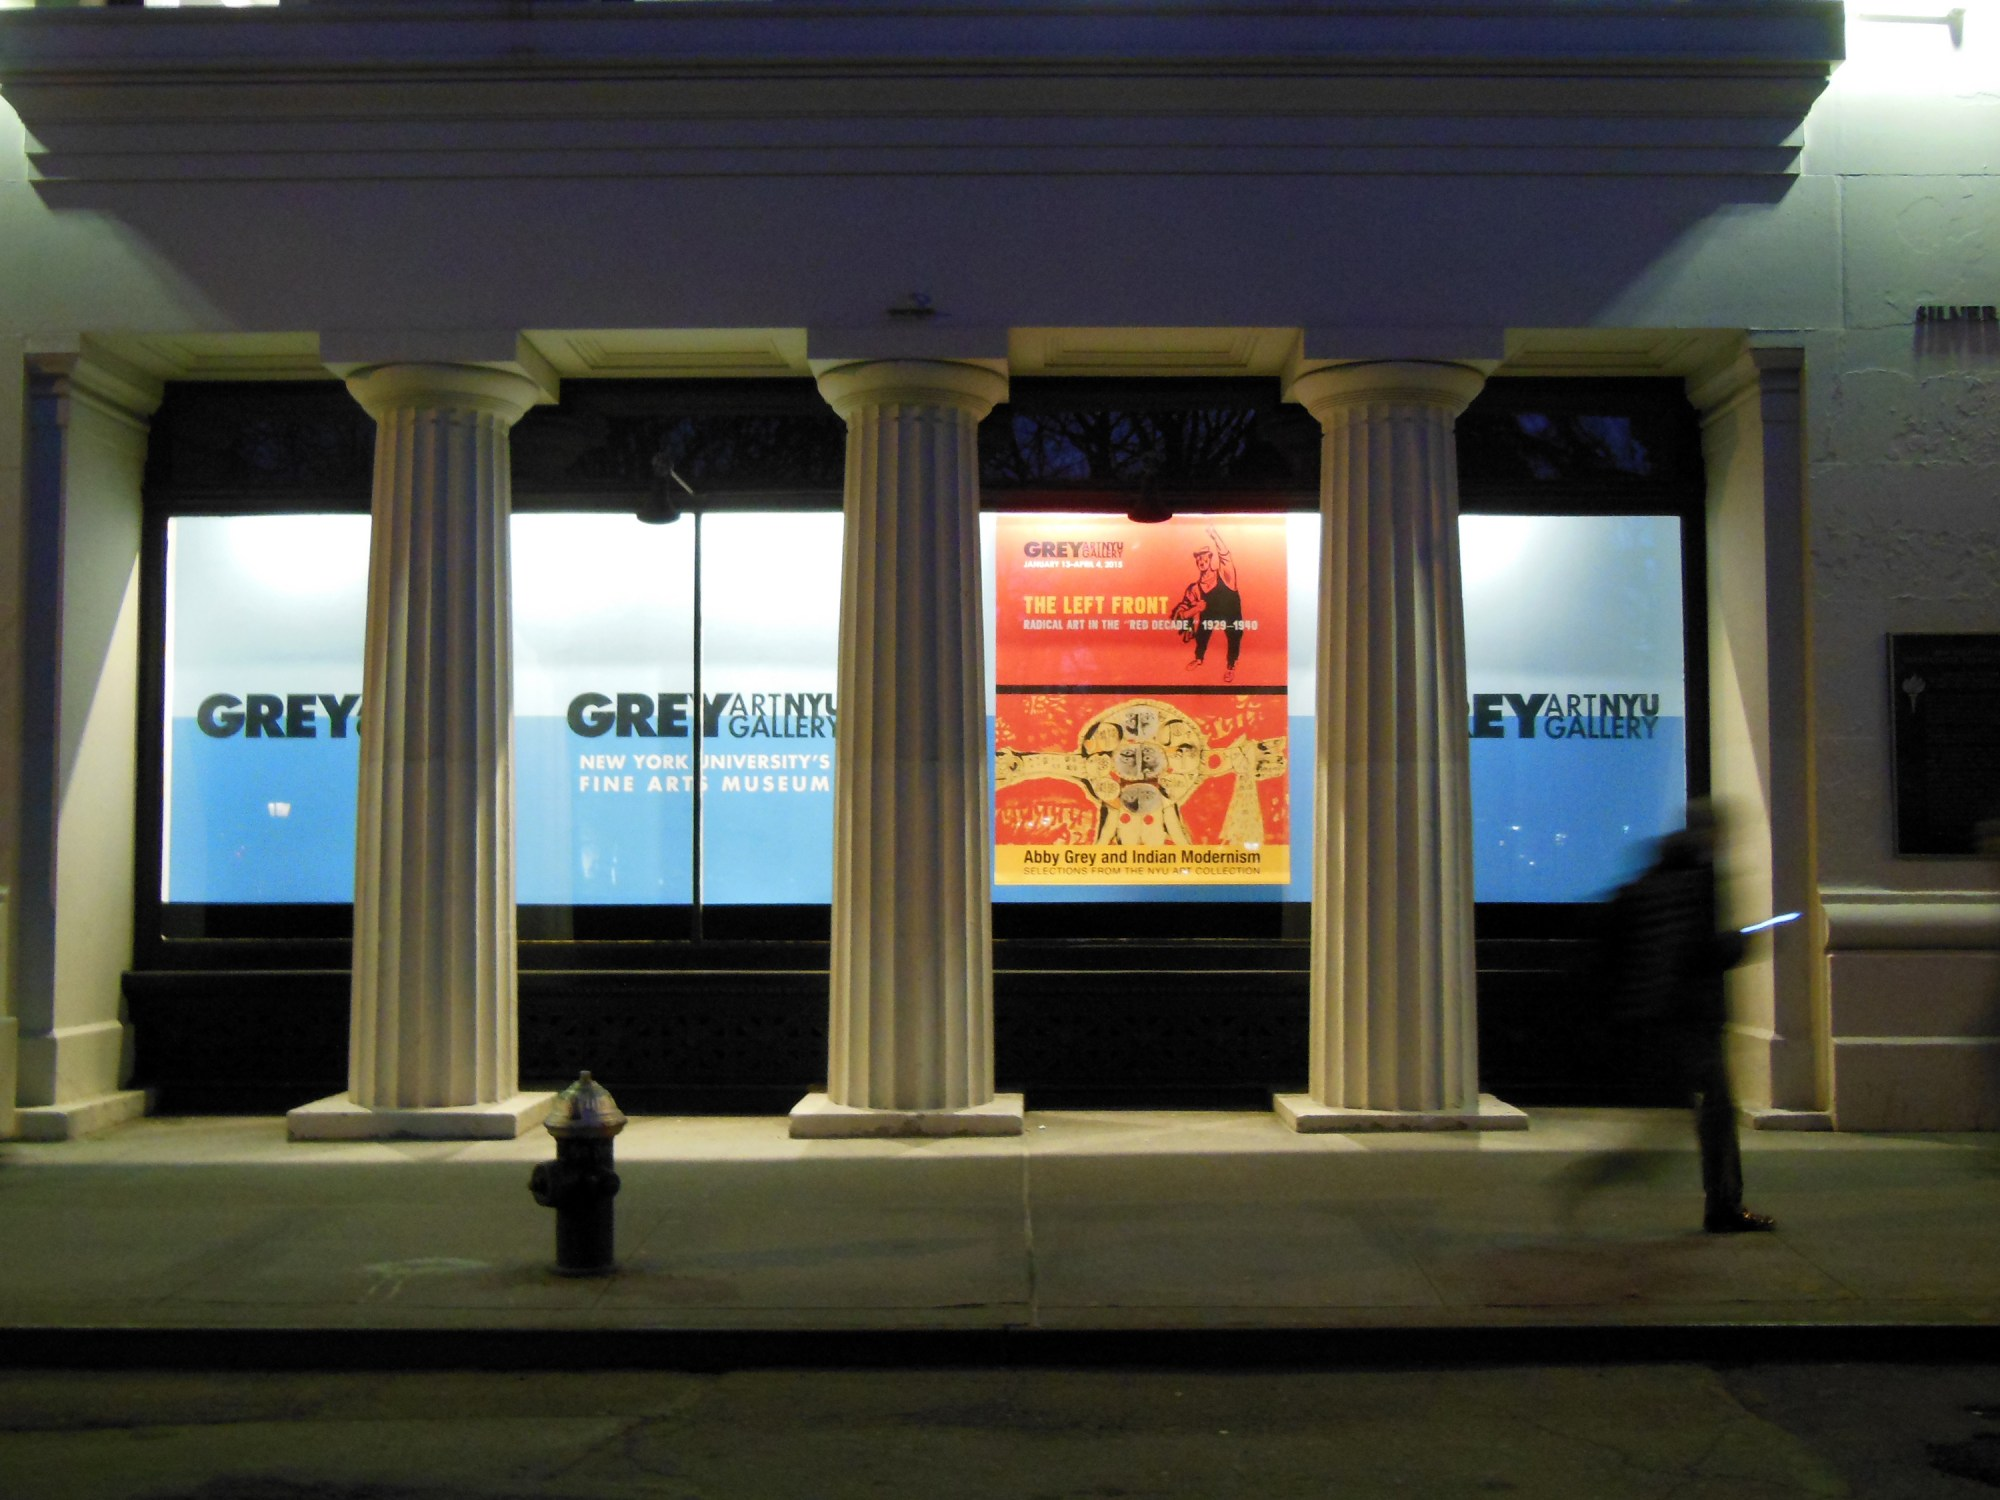 hight resolution of grey gallery at nyu